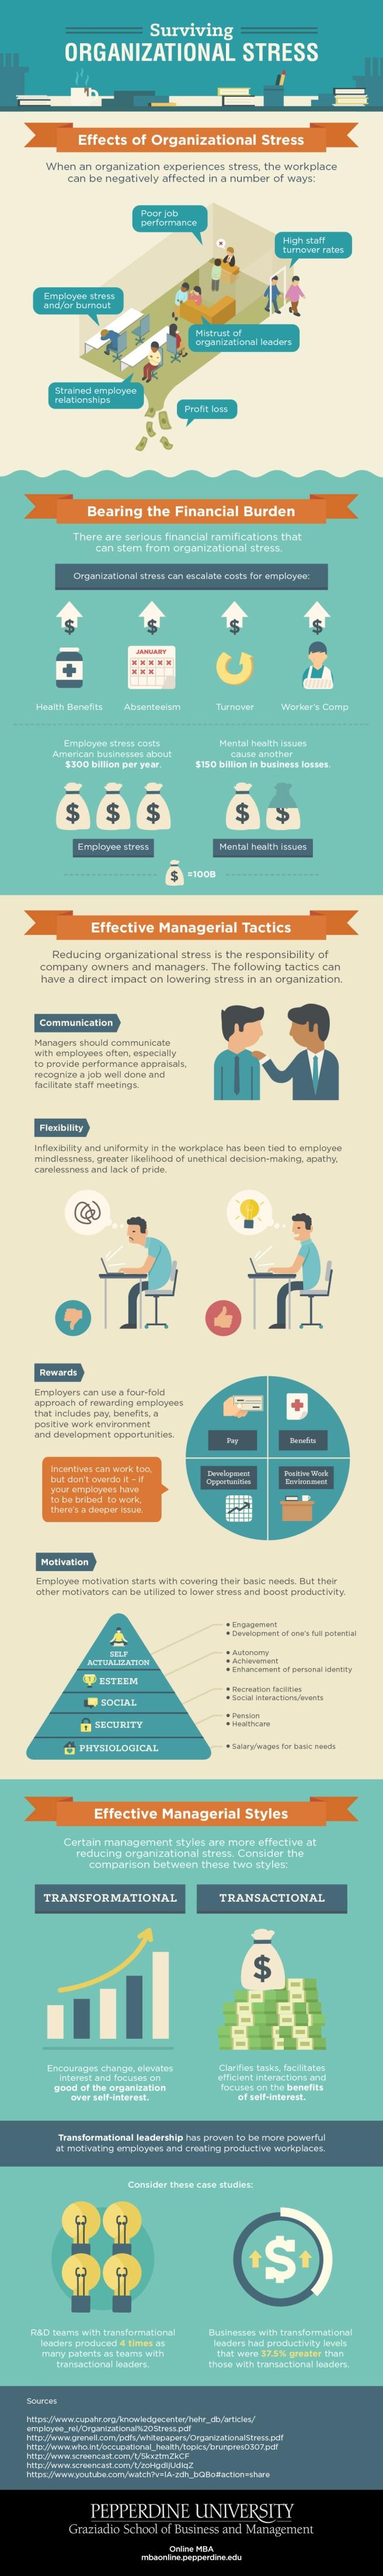 Surviving Organizational Stress [#Infographic]